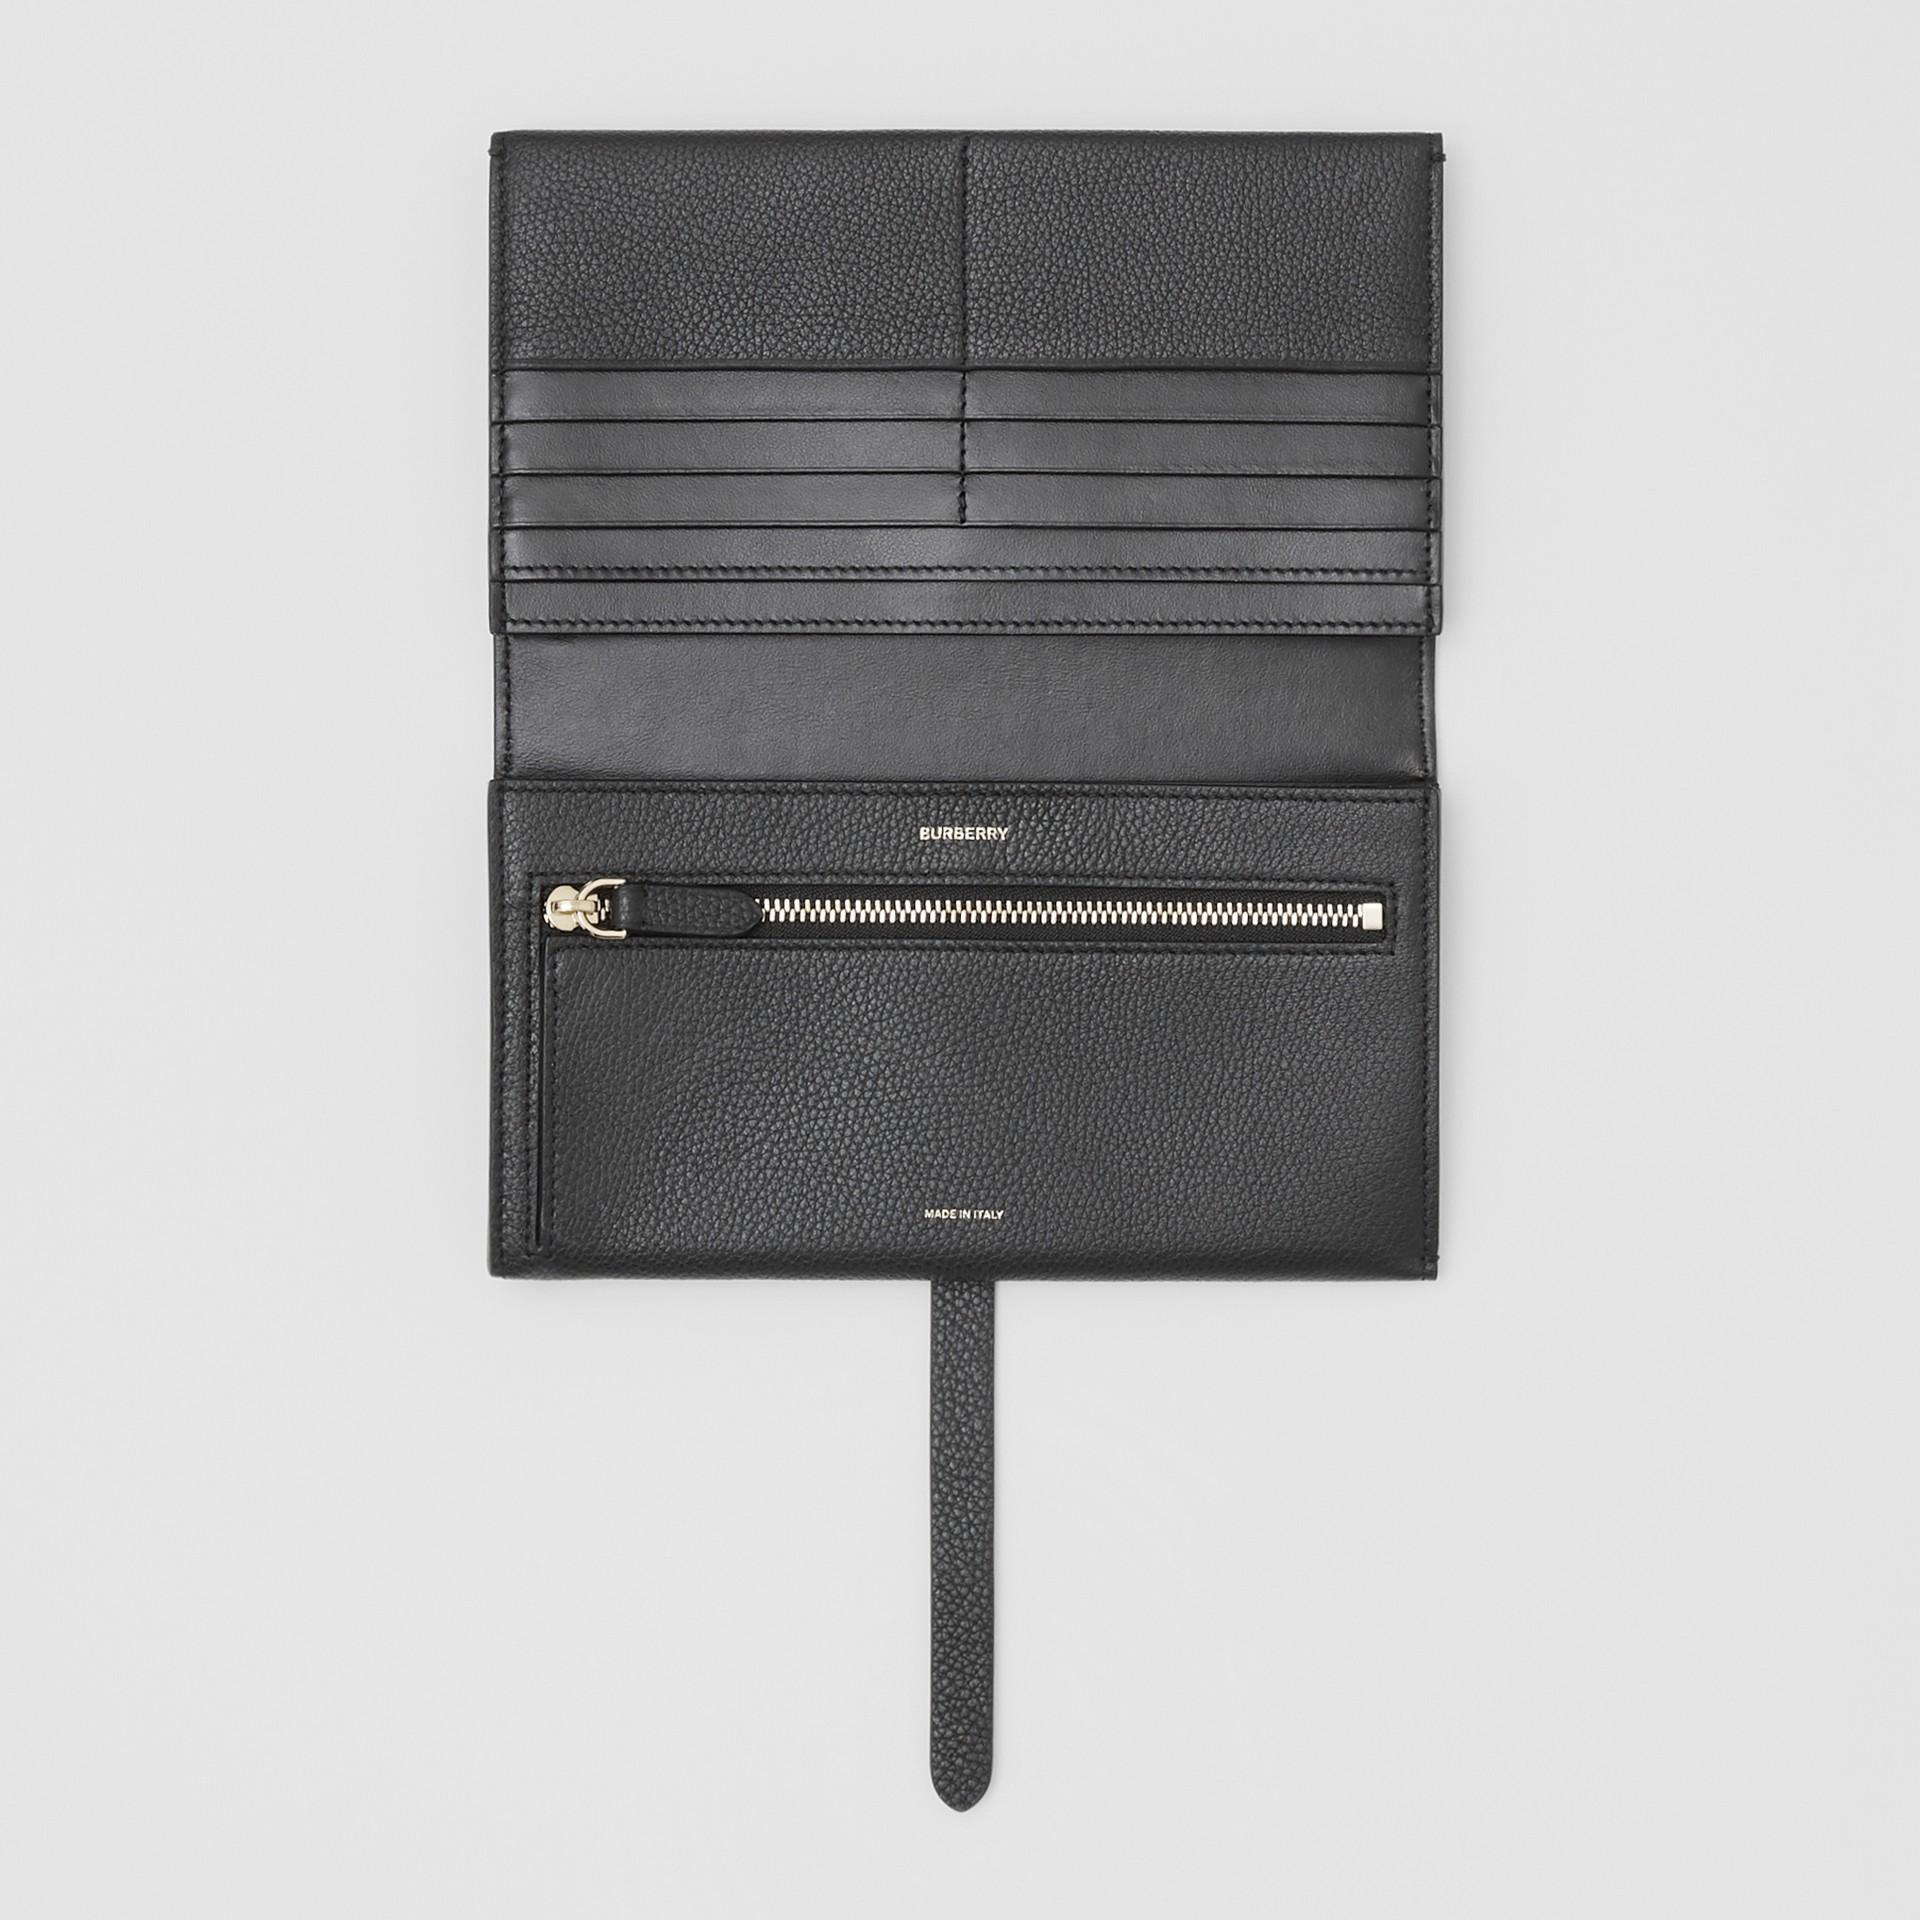 Monogram Motif Grainy Leather Folding Wallet in Black - Women | Burberry - gallery image 2